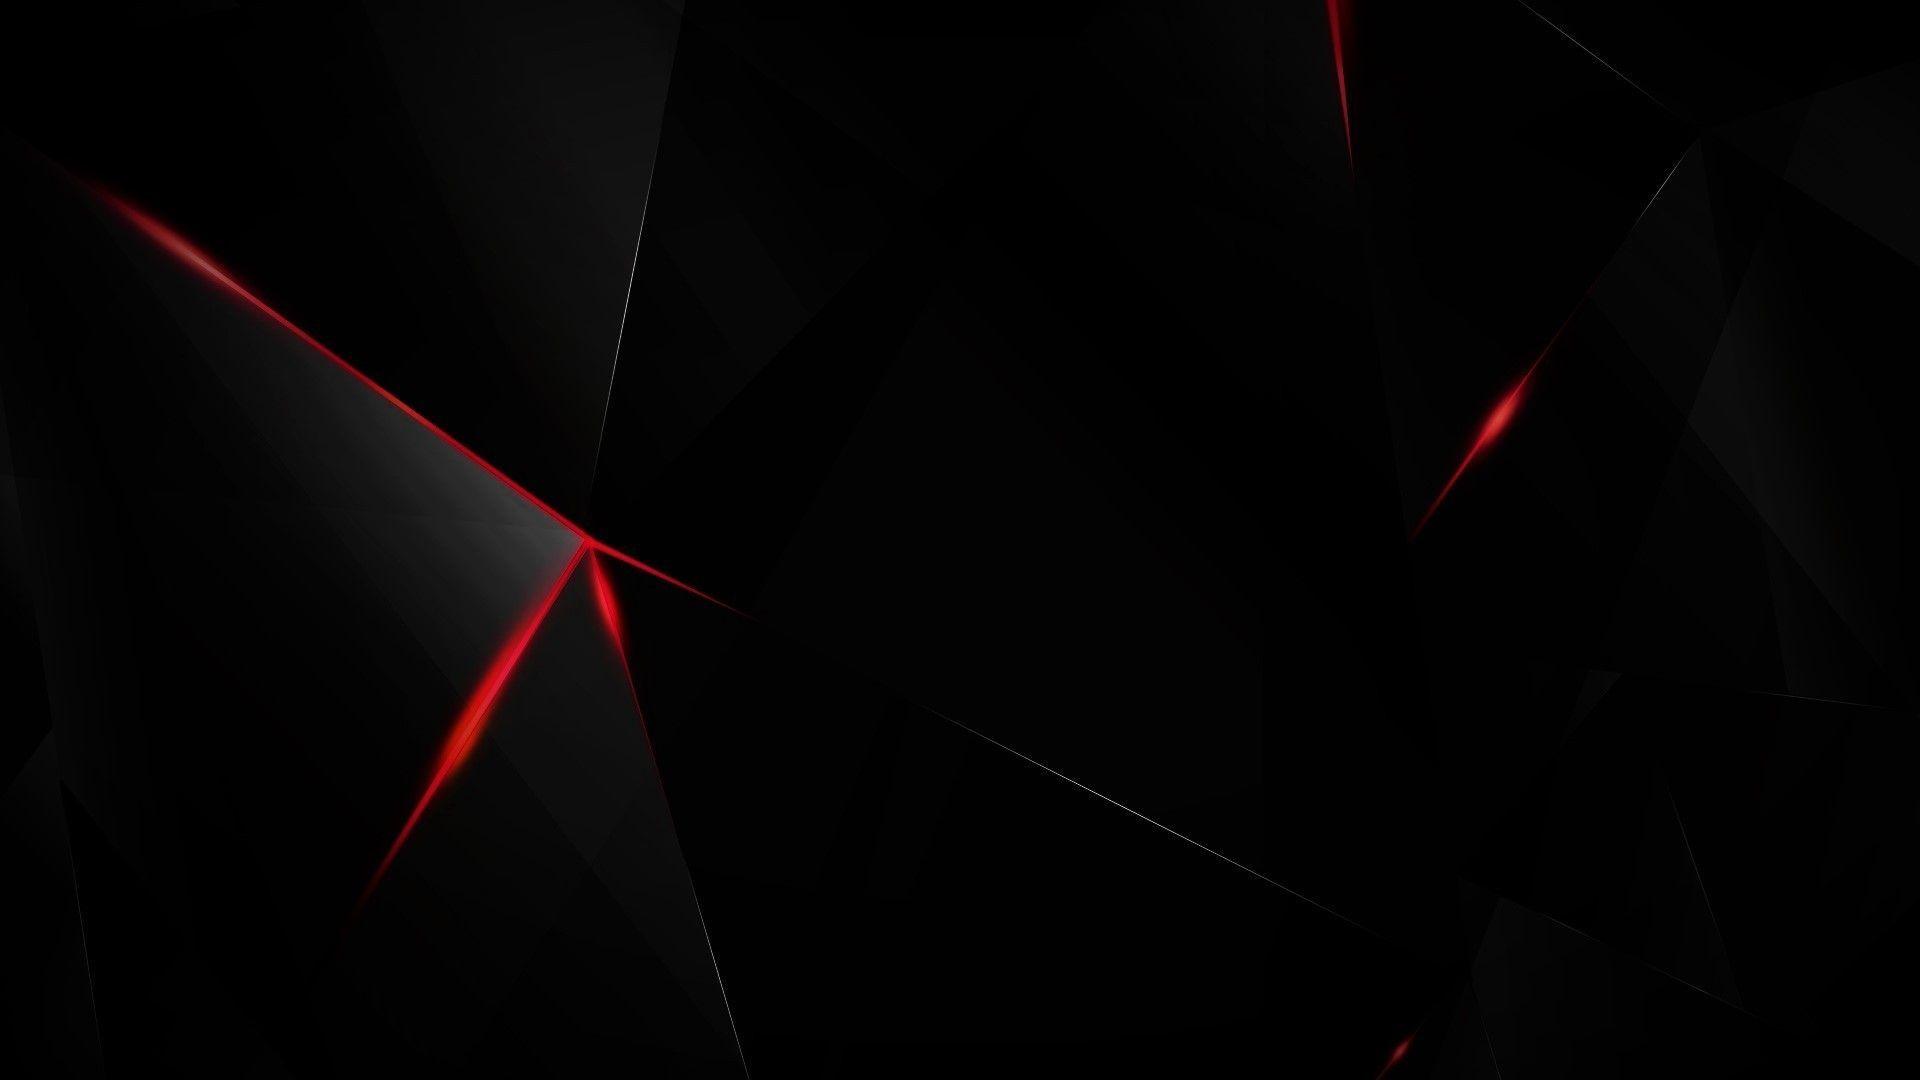 Dark Red Computer Wallpapers Wallpaper Cave